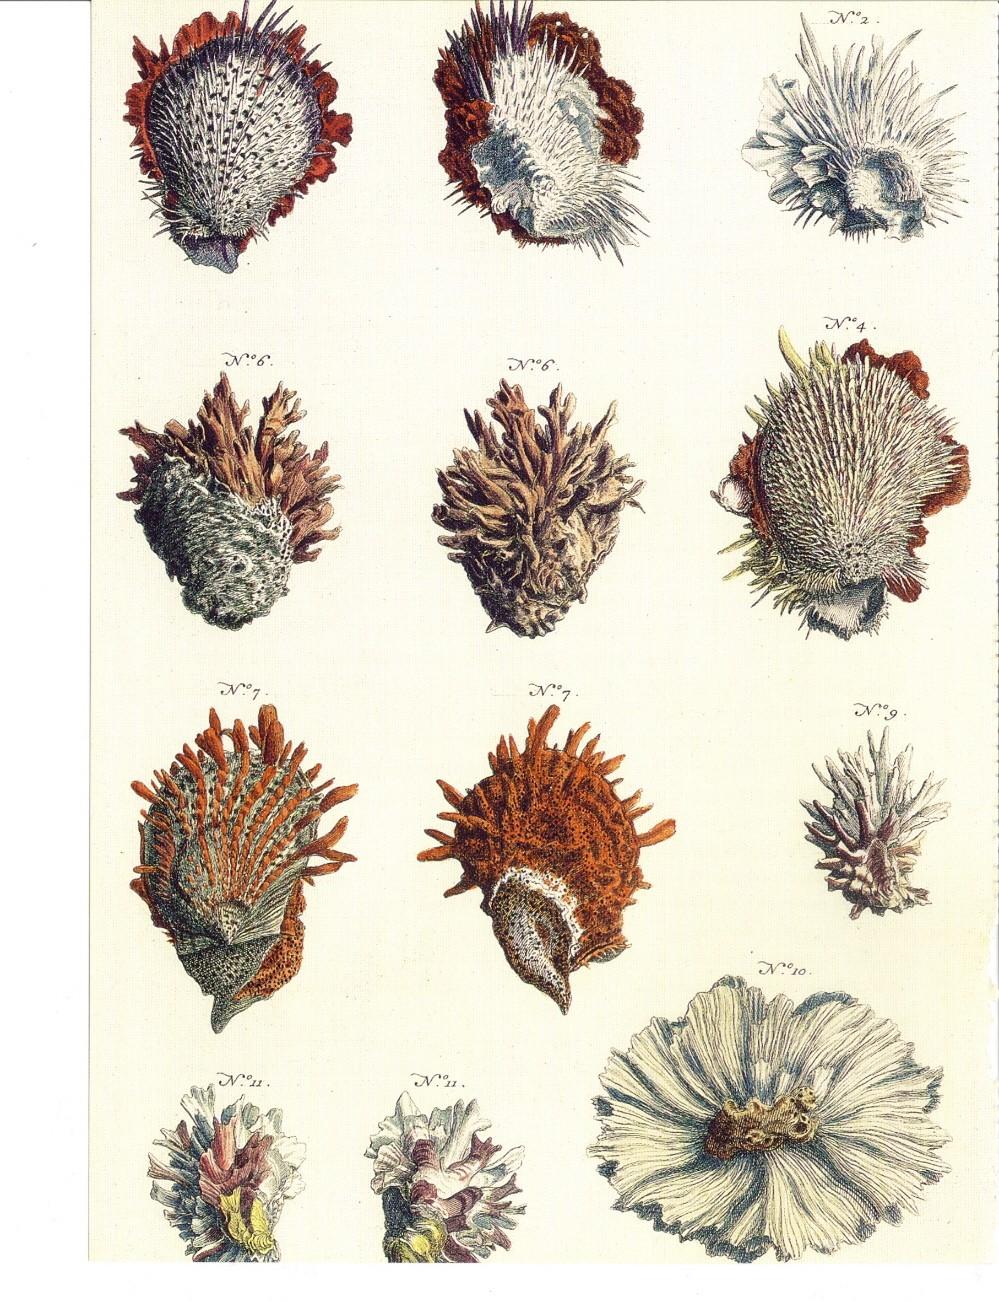 Seba. Cabinet of Natural Curiosities - Not available - TASCHEN Books